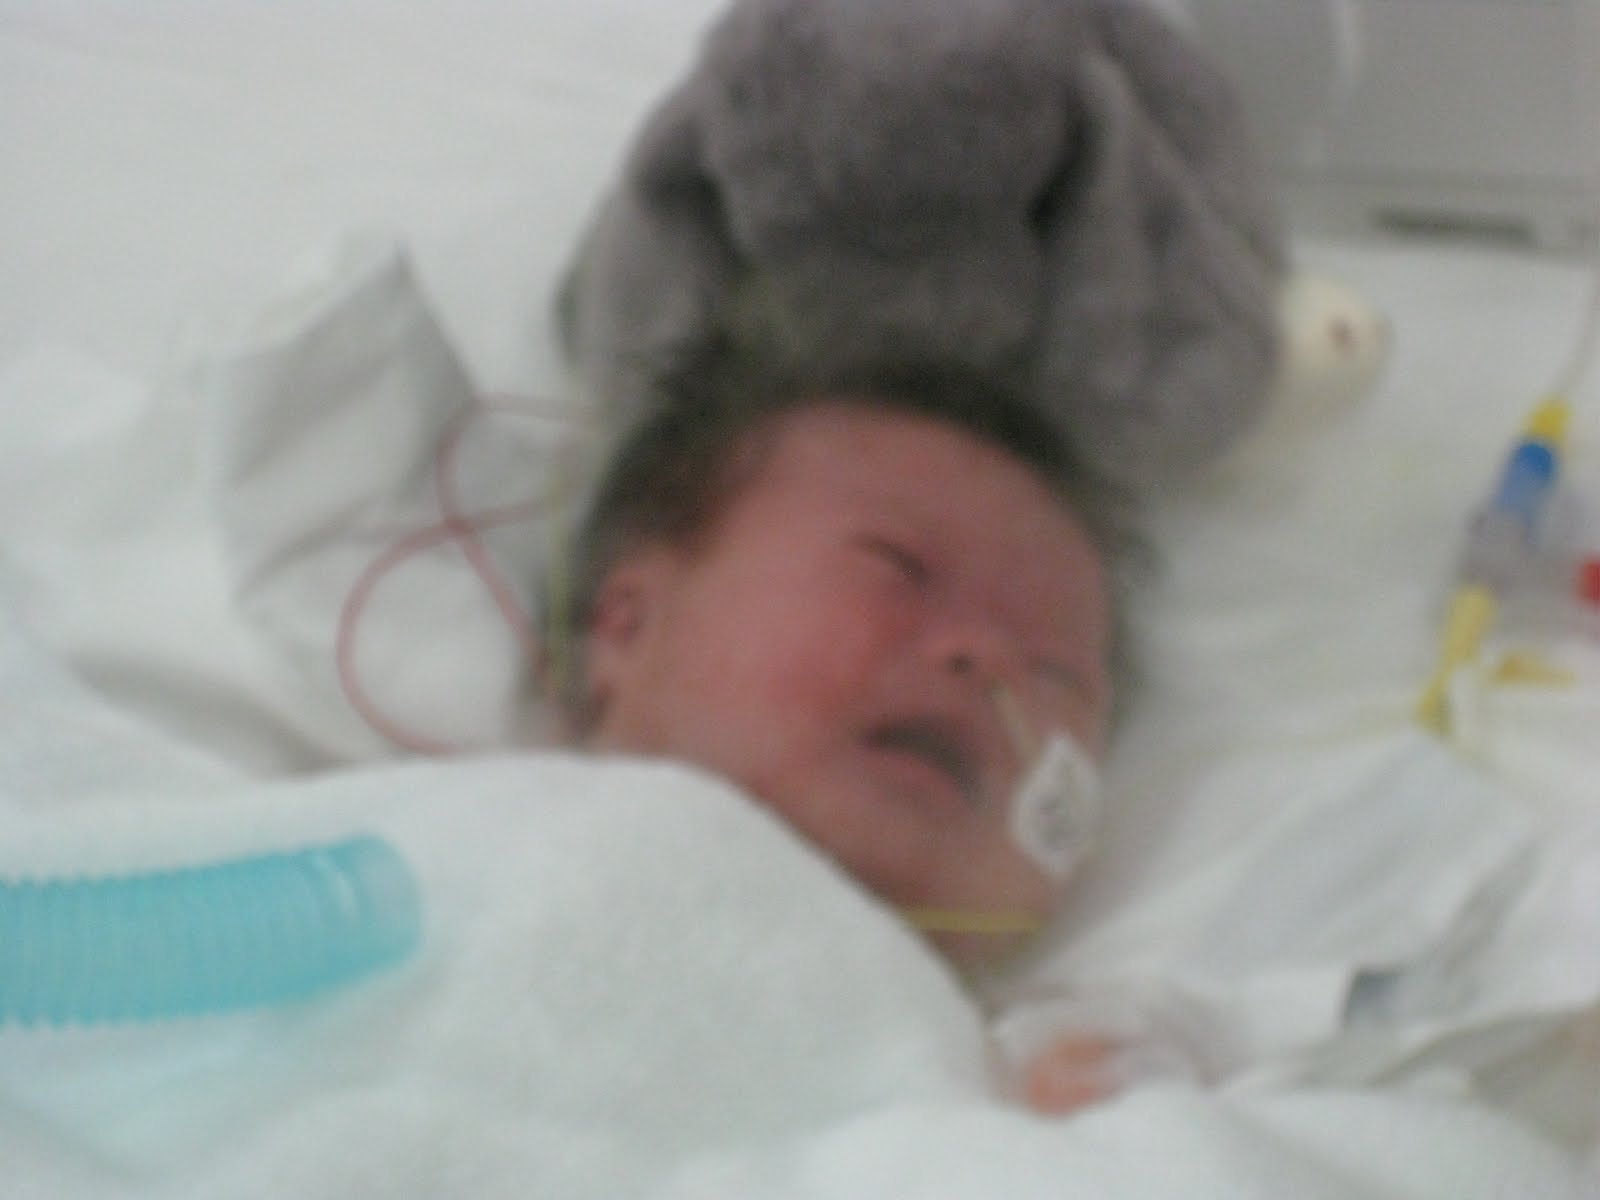 Our Lil Angel Gabriel: July 2011 #487E83